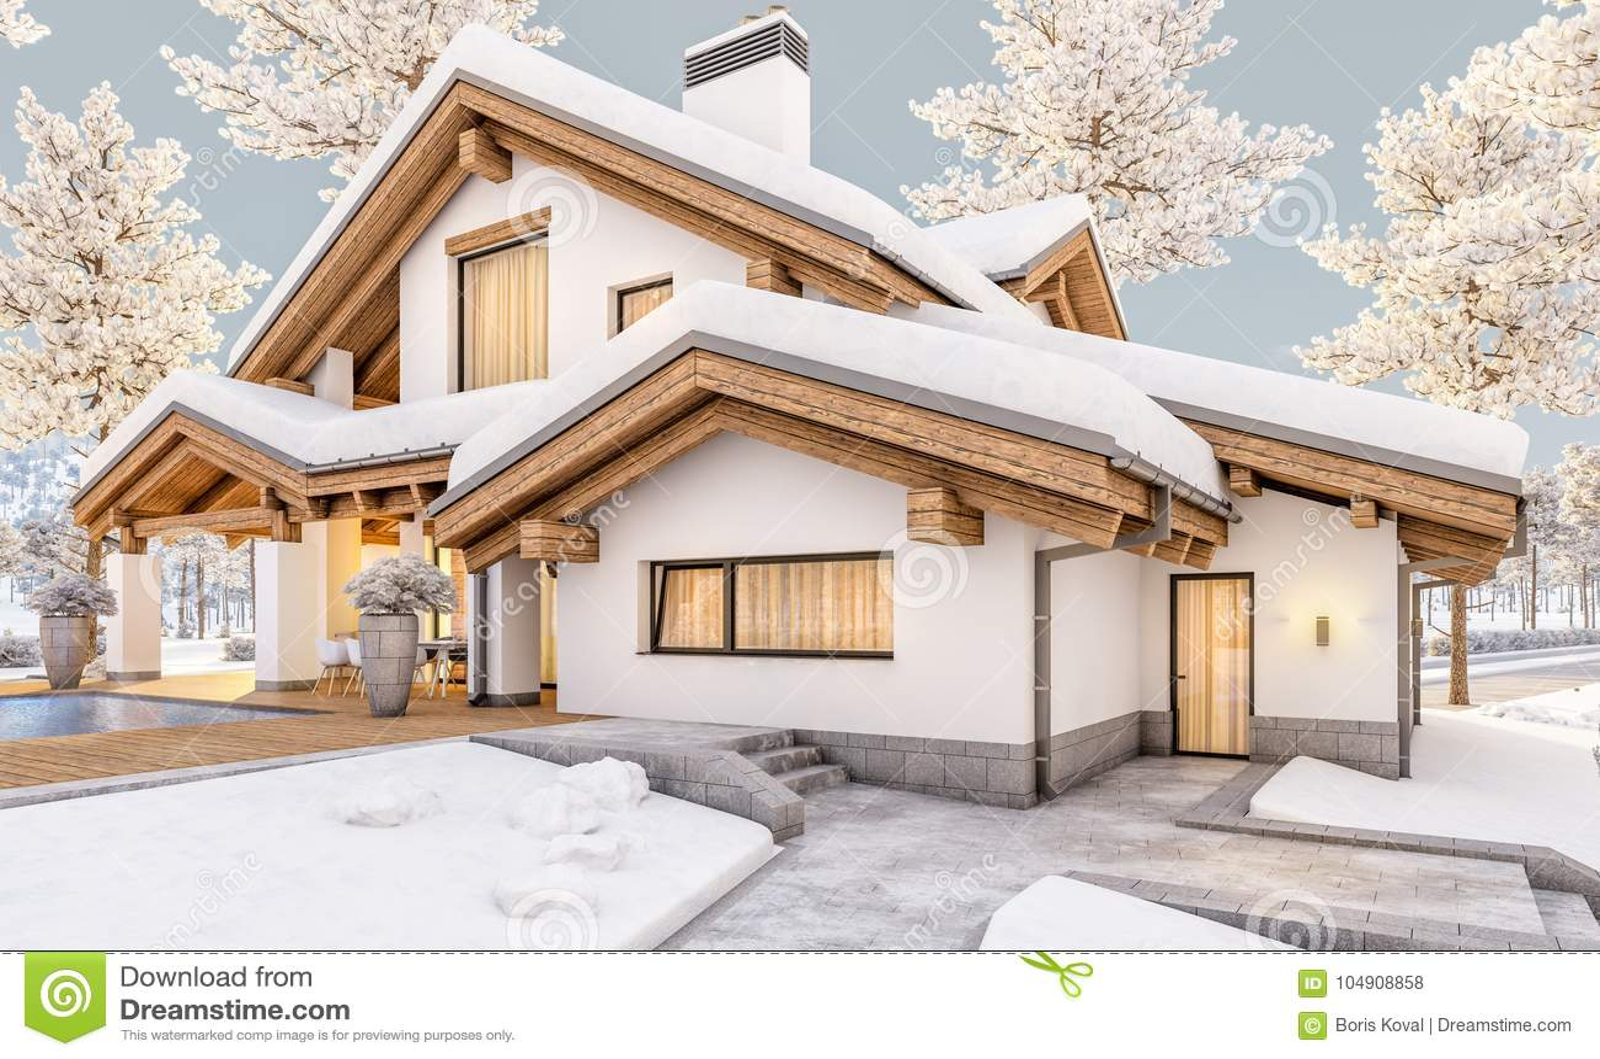 3d rendering of modern cozy house in chalet style stock illustration illustration 104908858 - Moderner chalet stil ...